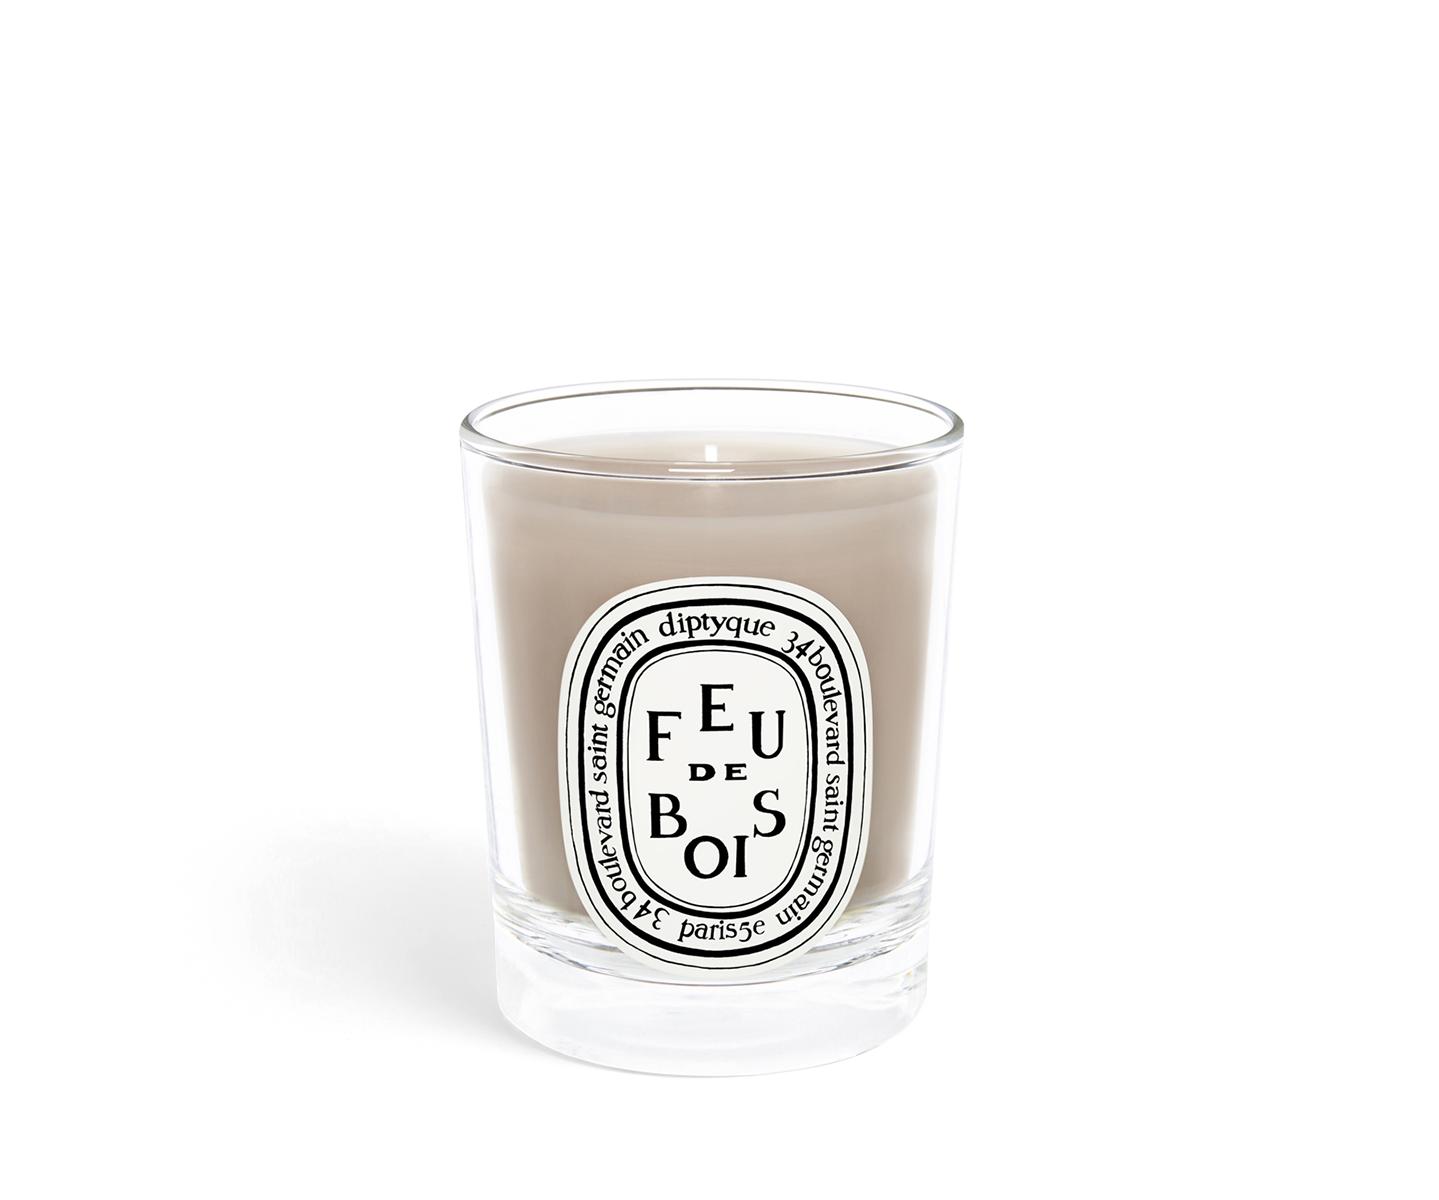 Feu de Bois / Wood Fire small candle